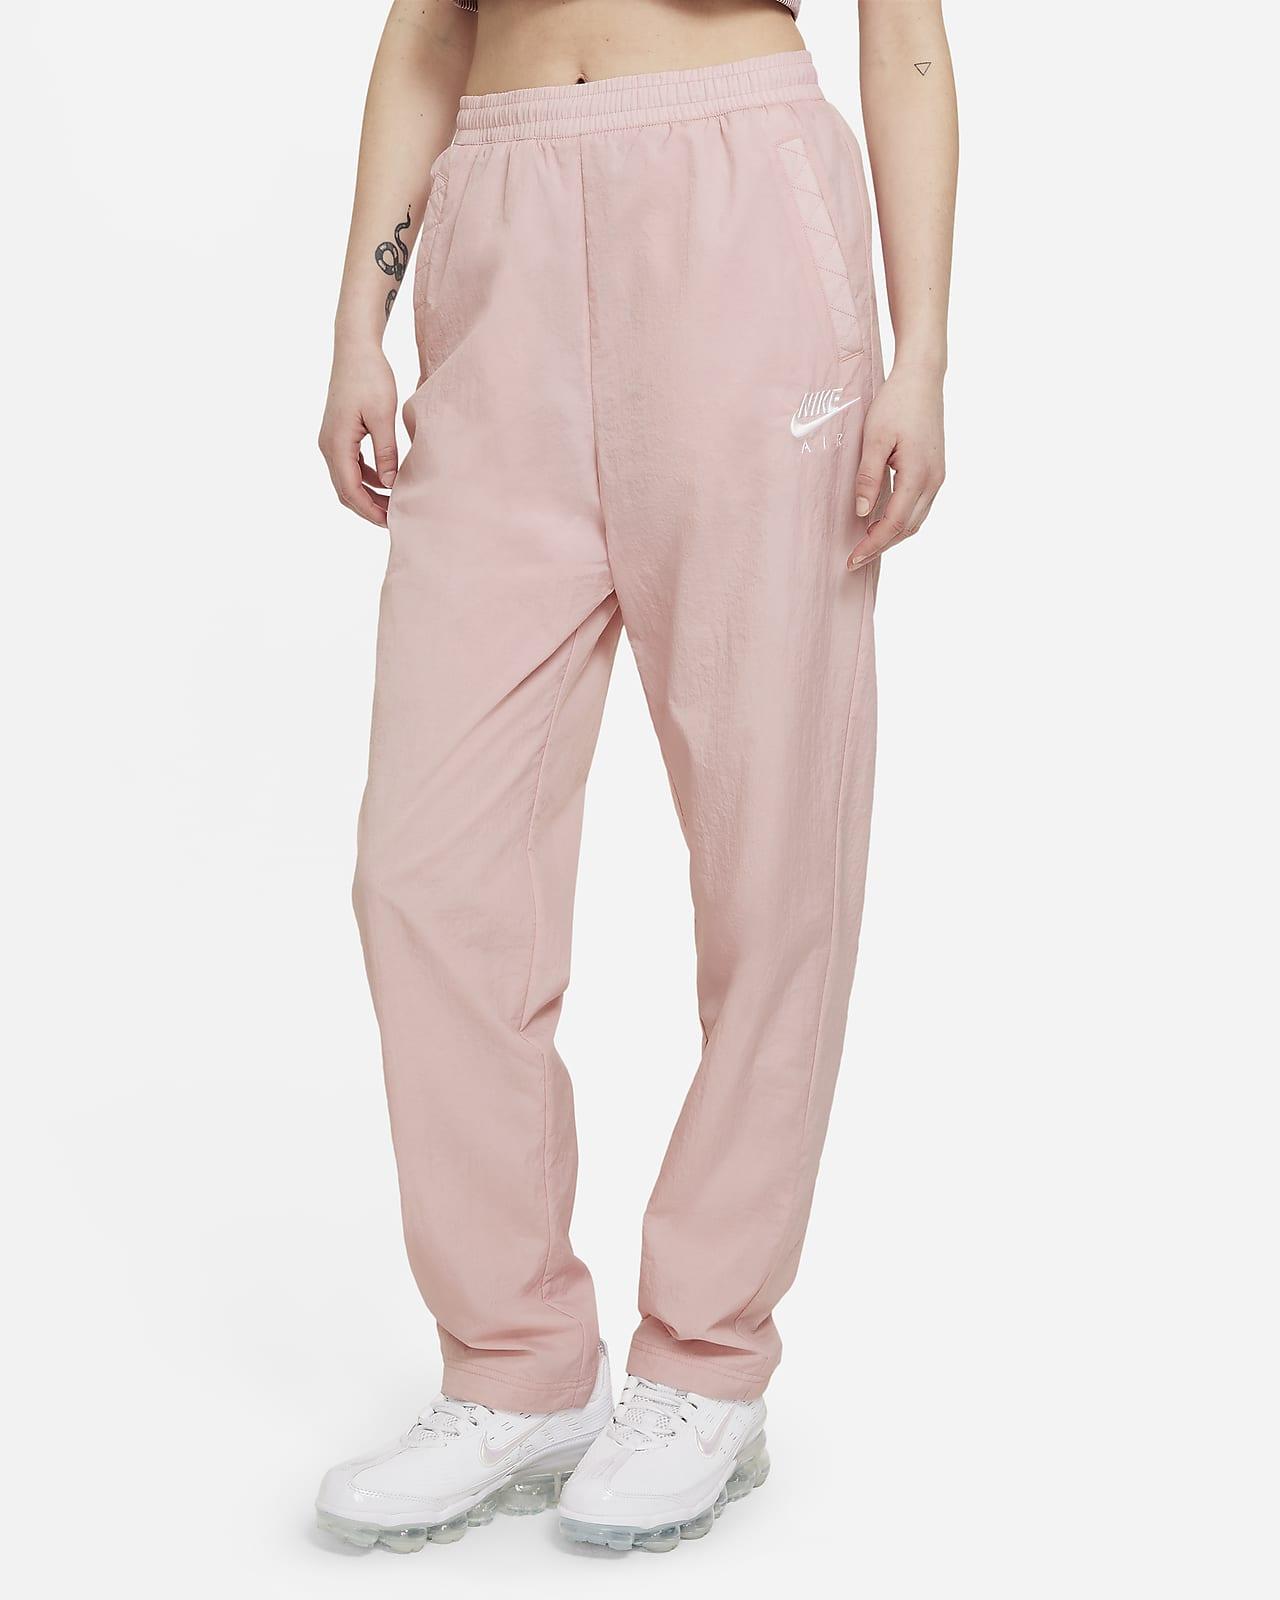 Pantalon tissé Nike Air pour Femme